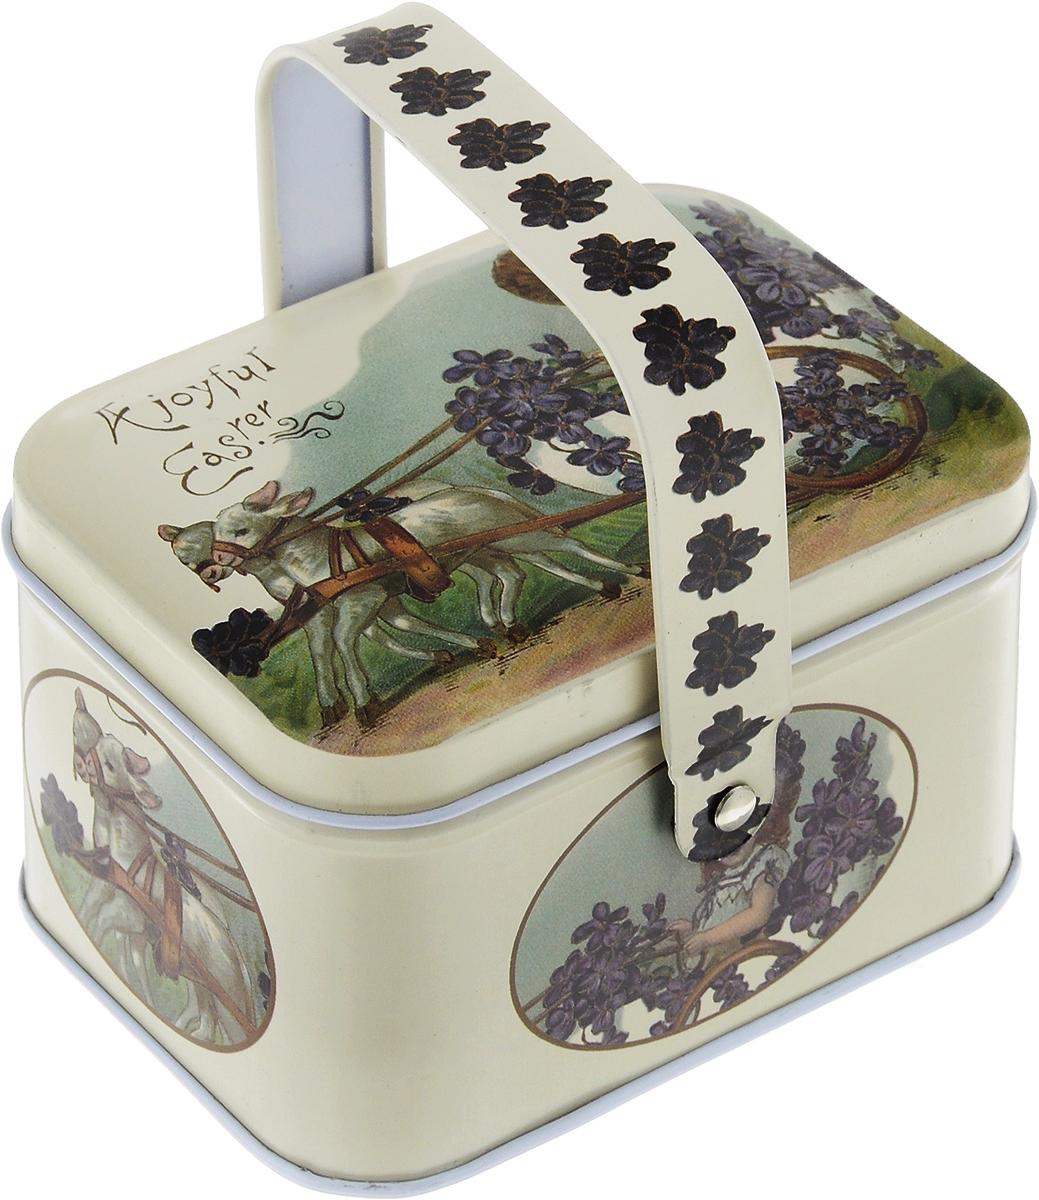 Коробка для хранения мелочей Hobby & Pro, 10,5 х 8 х 6 см. 7712767/941006 шкатулка для рукоделия hobby